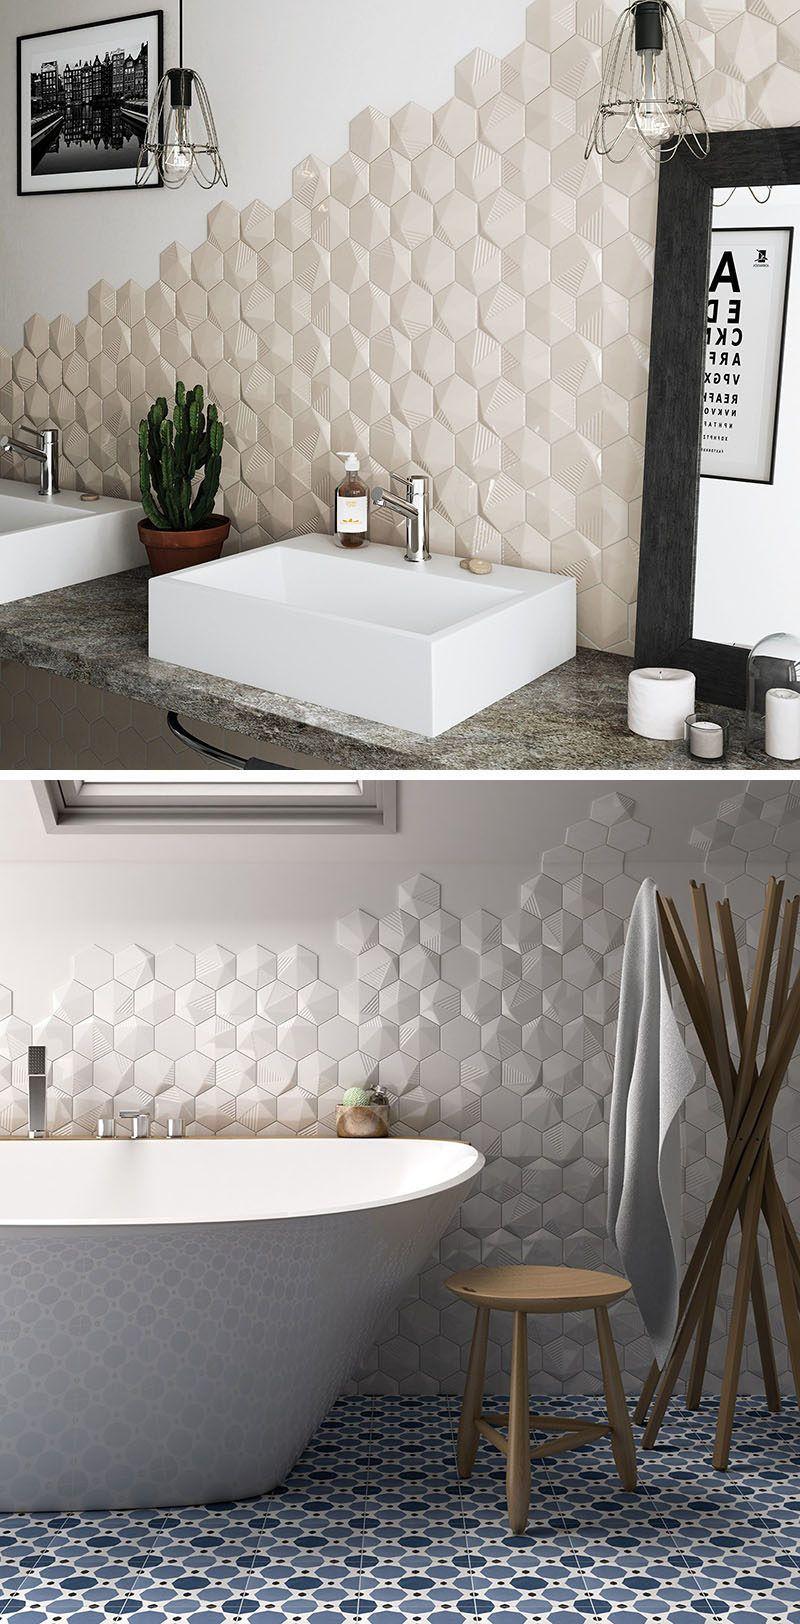 Replacing a retro coloured bathroom suite - Bathroom Tile Idea Install 3d Tiles To Add Texture To Your Bathroom